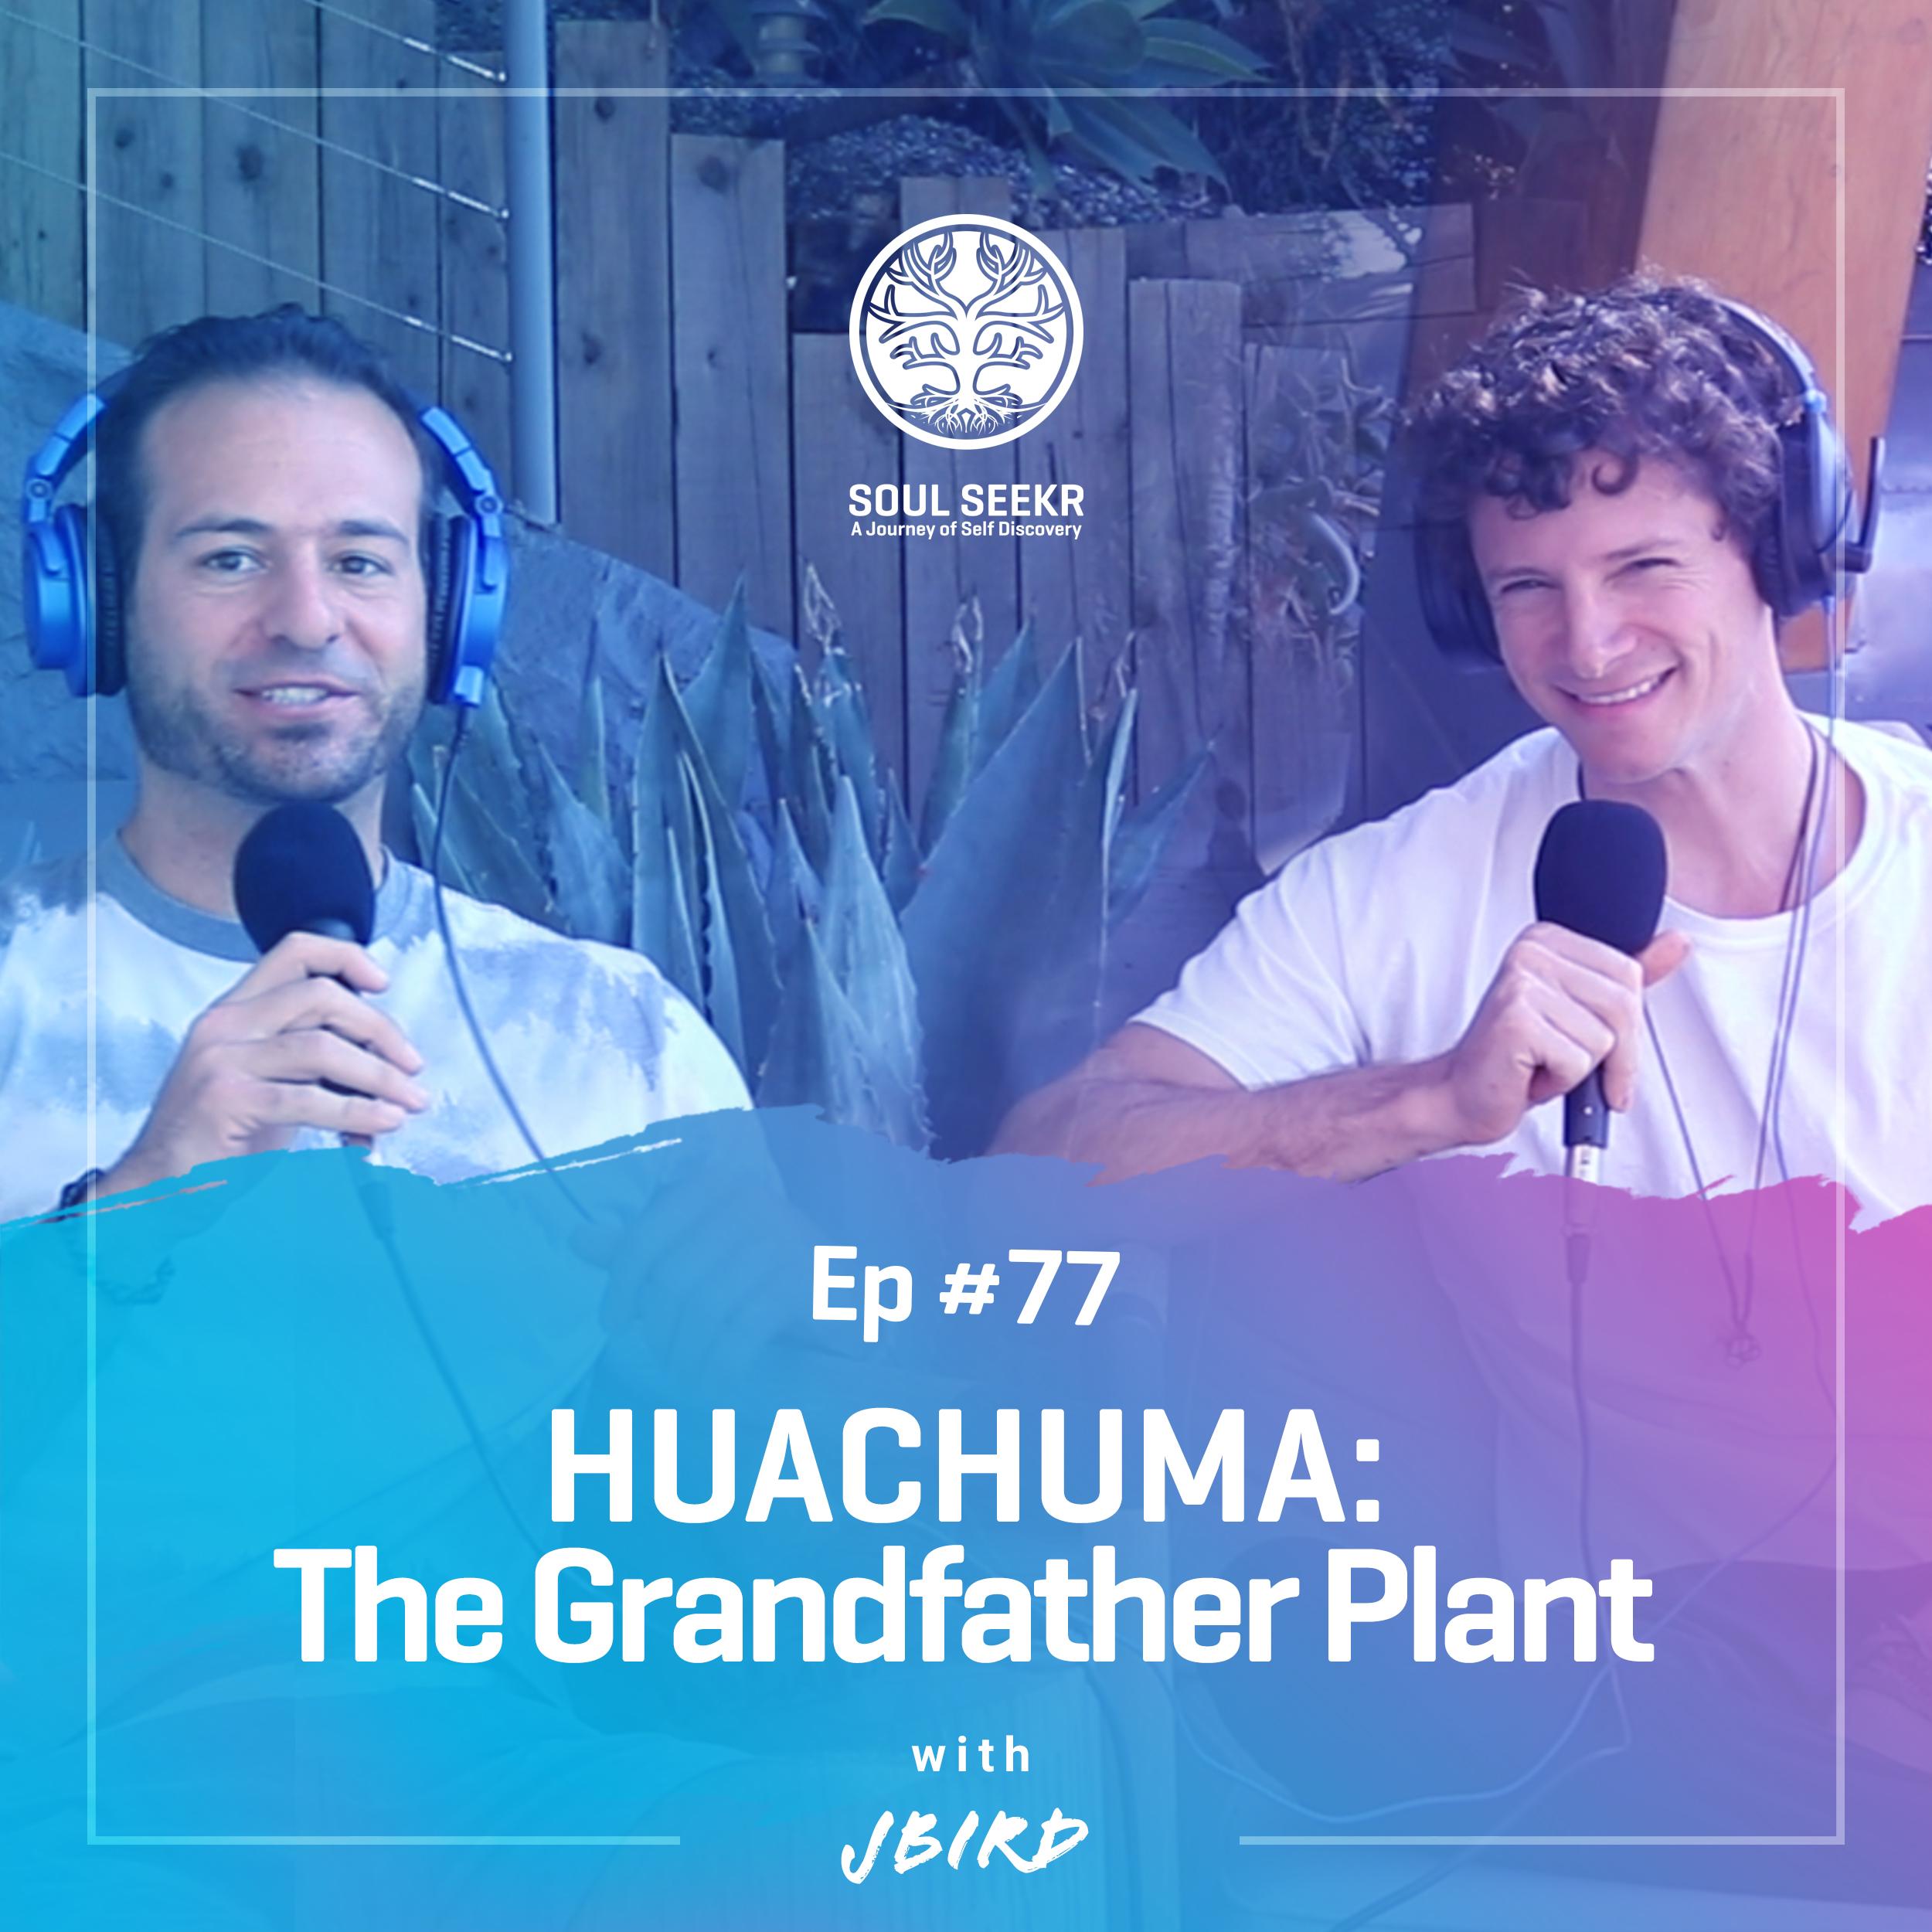 #77: Huachuma: The Grandfather Plant with Jbird